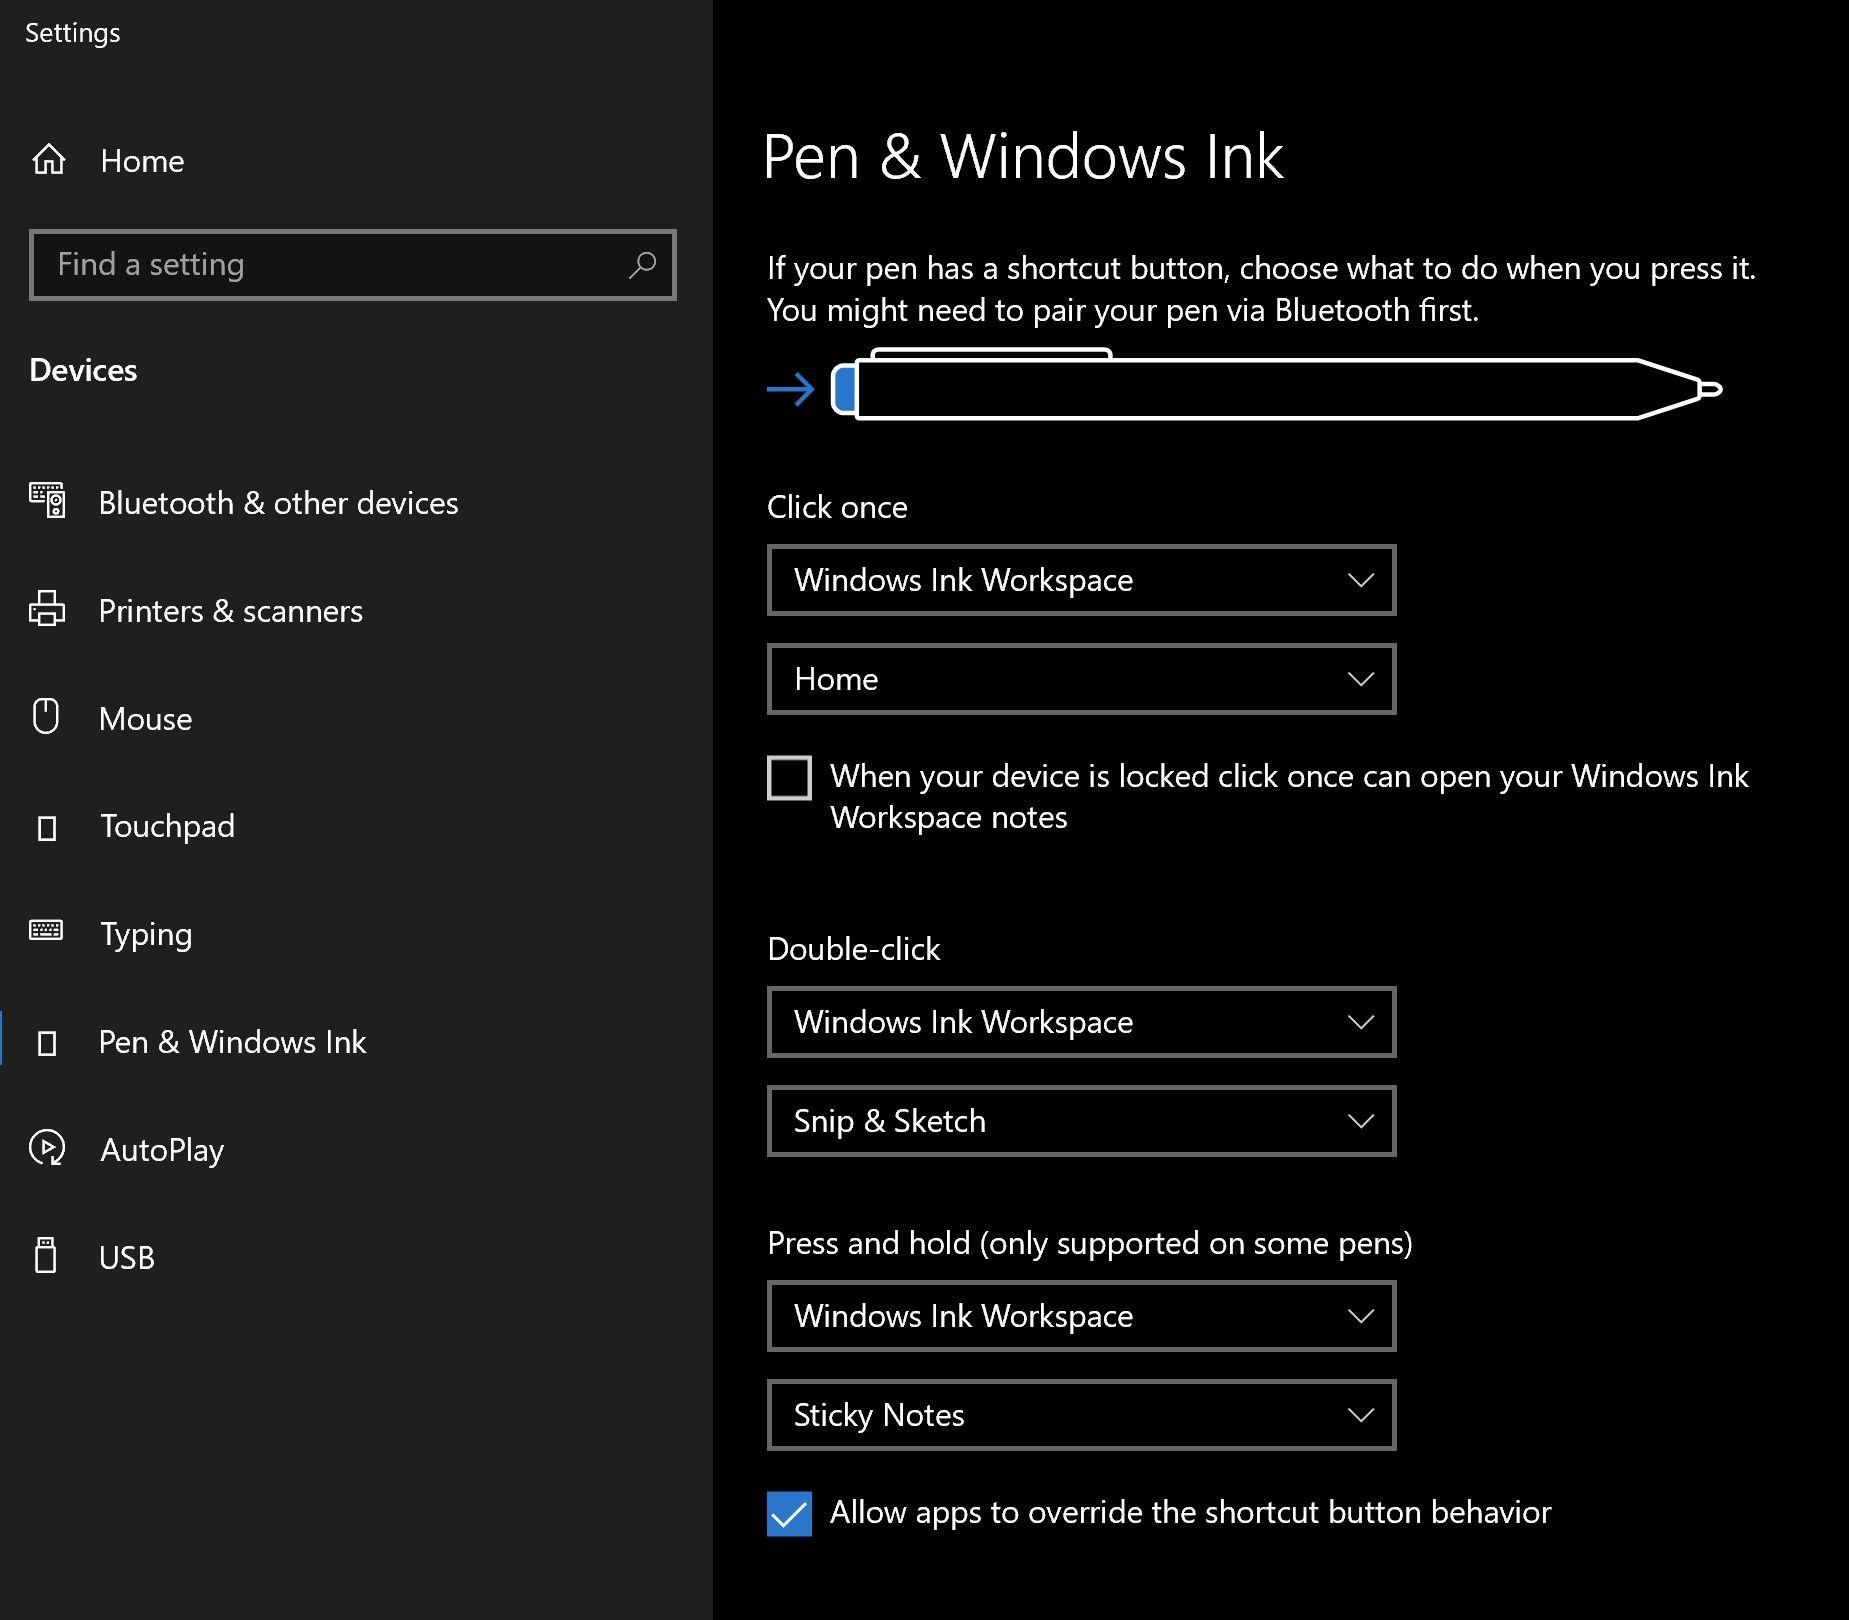 pen_and_windows_ink.jpg